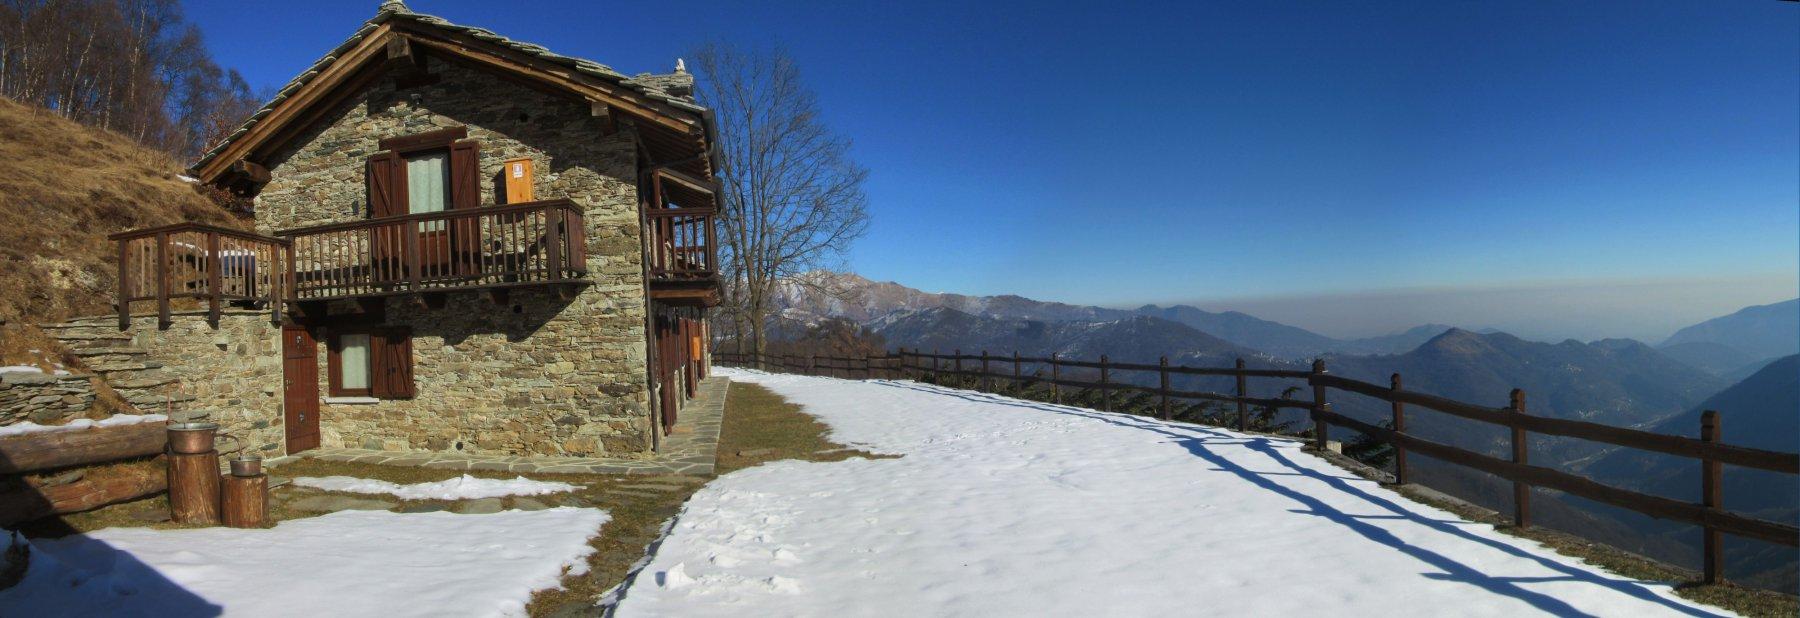 Splendido panorama dall'Alpe